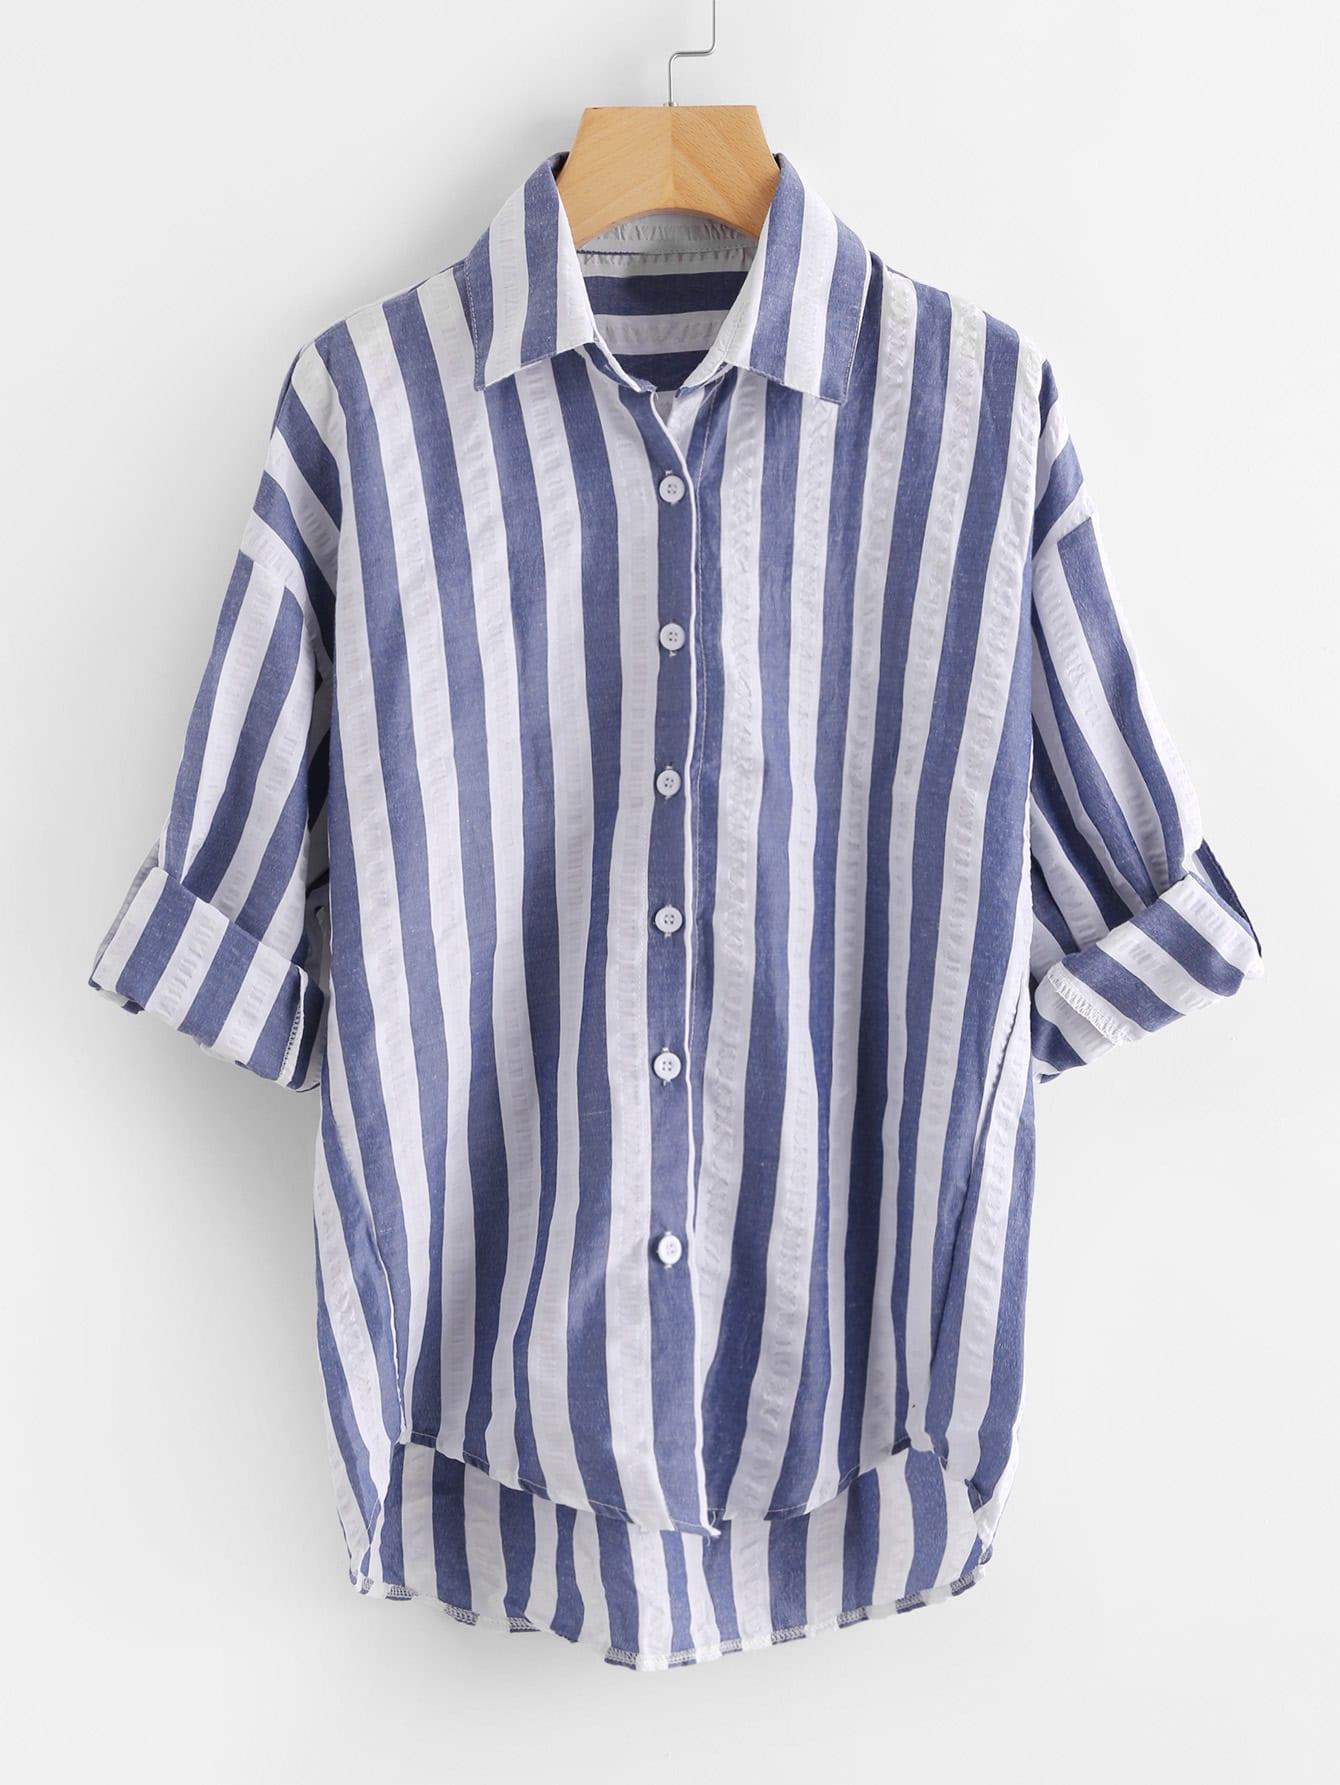 Contrast Striped Drop Shoulder Rolled Sleeve Shirt two tone drop shoulder sweatshirt